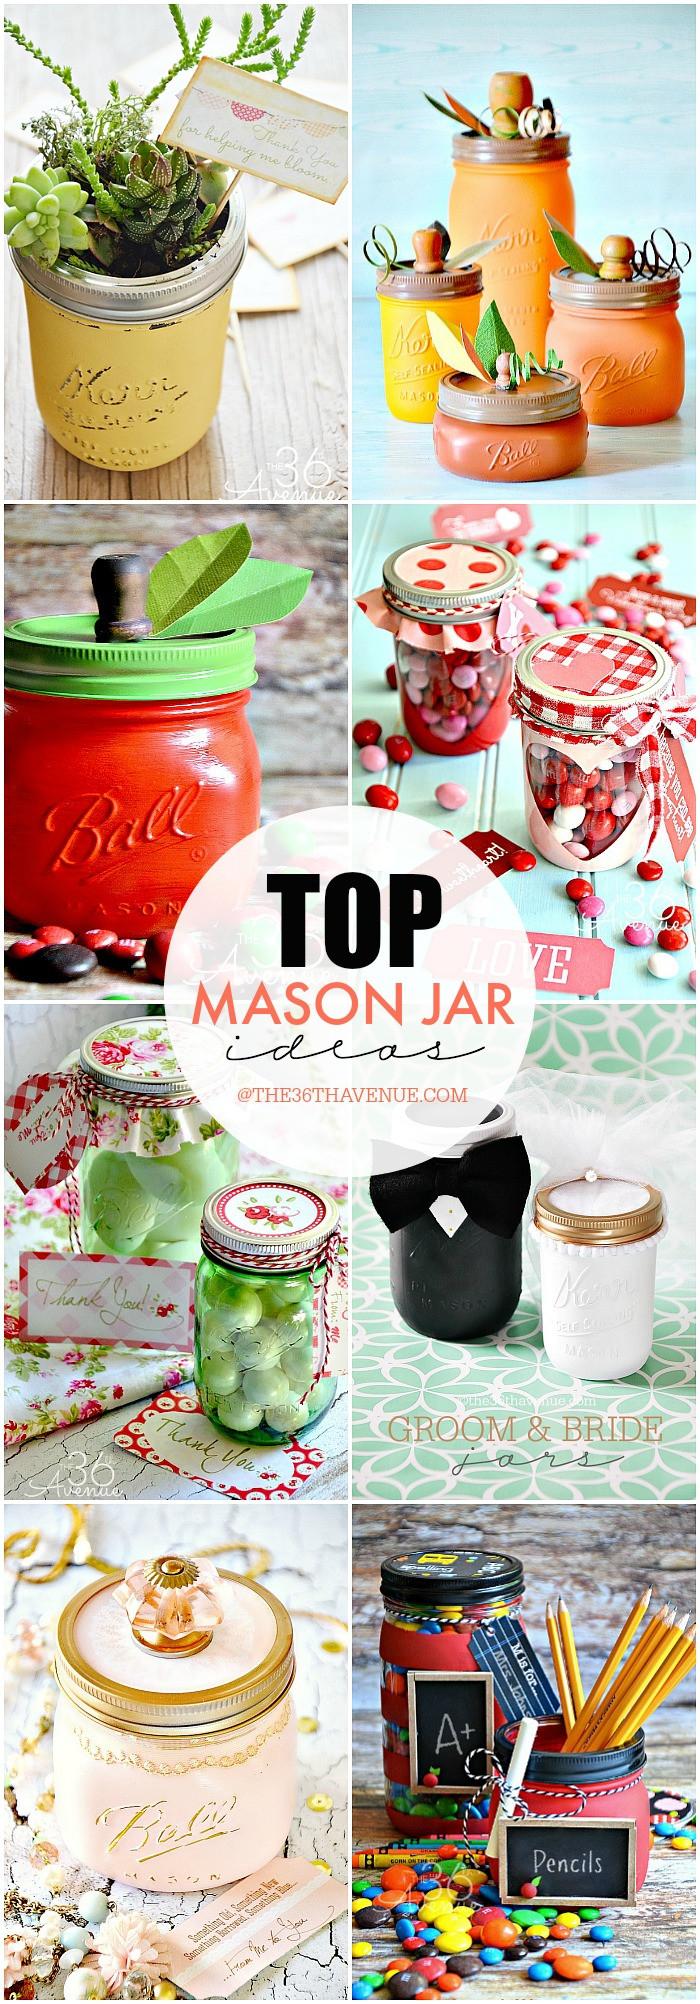 Best ideas about Mason Jar Craft Ideas . Save or Pin The 36th AVENUE Top Mason Jar Craft Ideas Now.